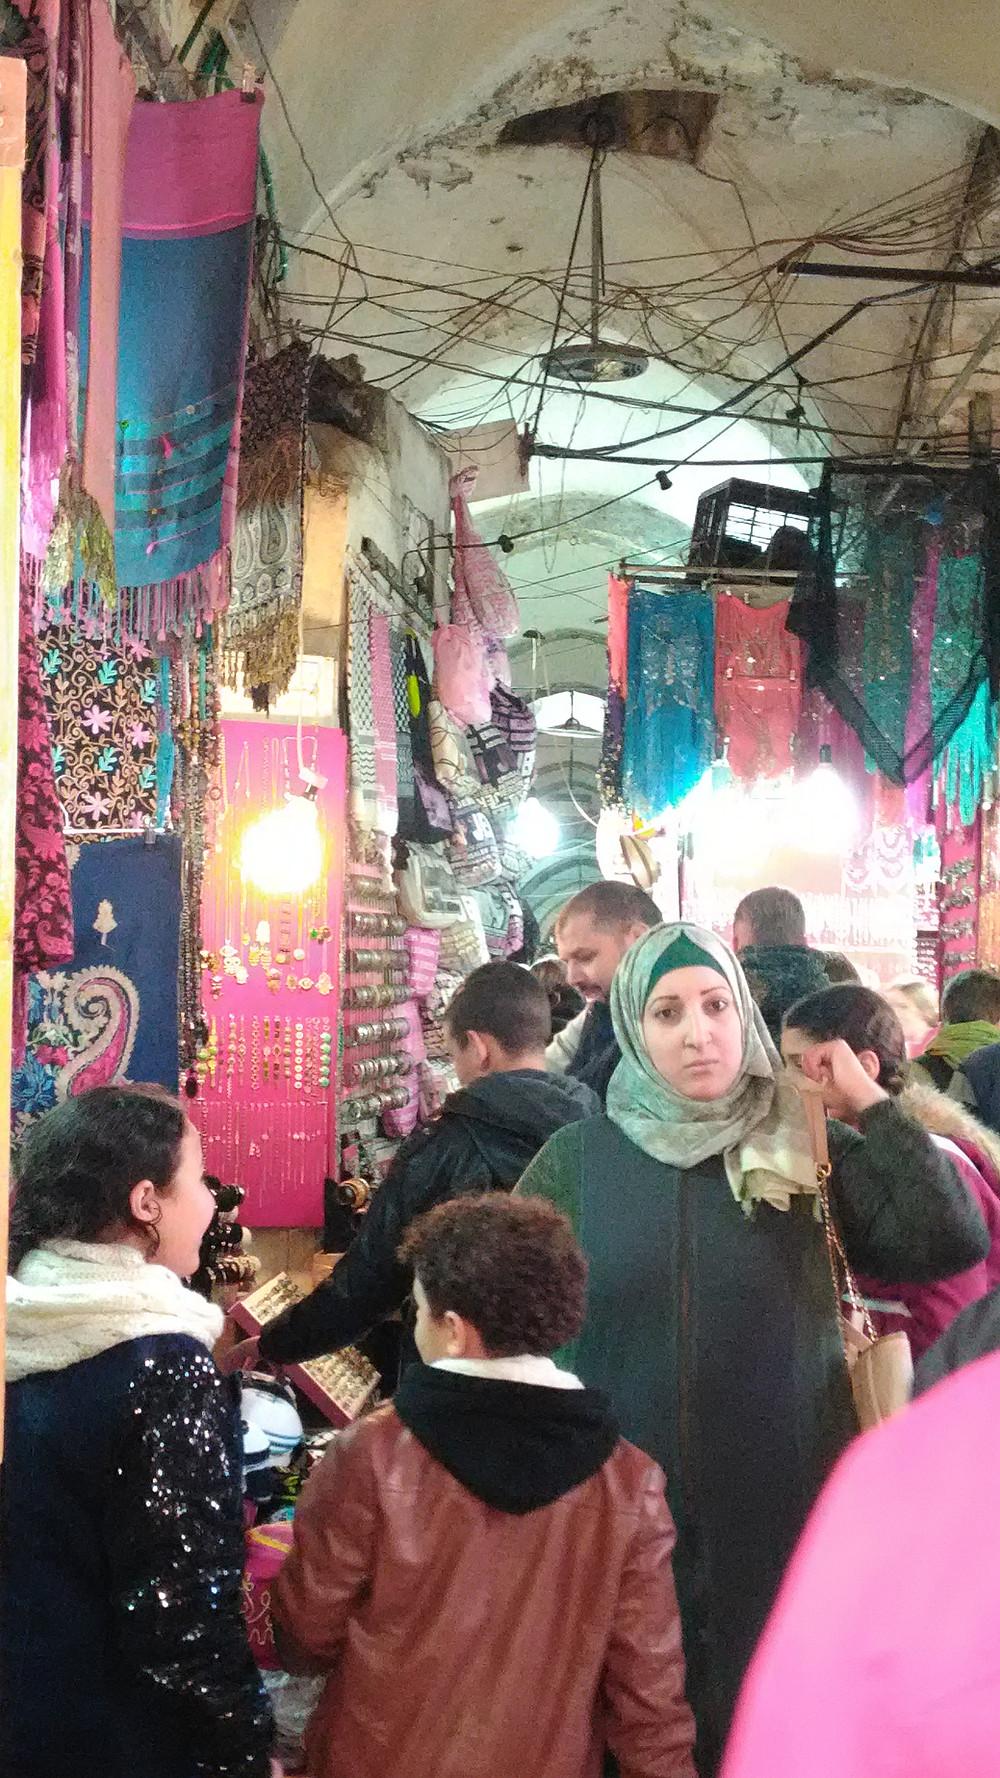 Jerusalemin vanhan kaupungin värikäs basaari.